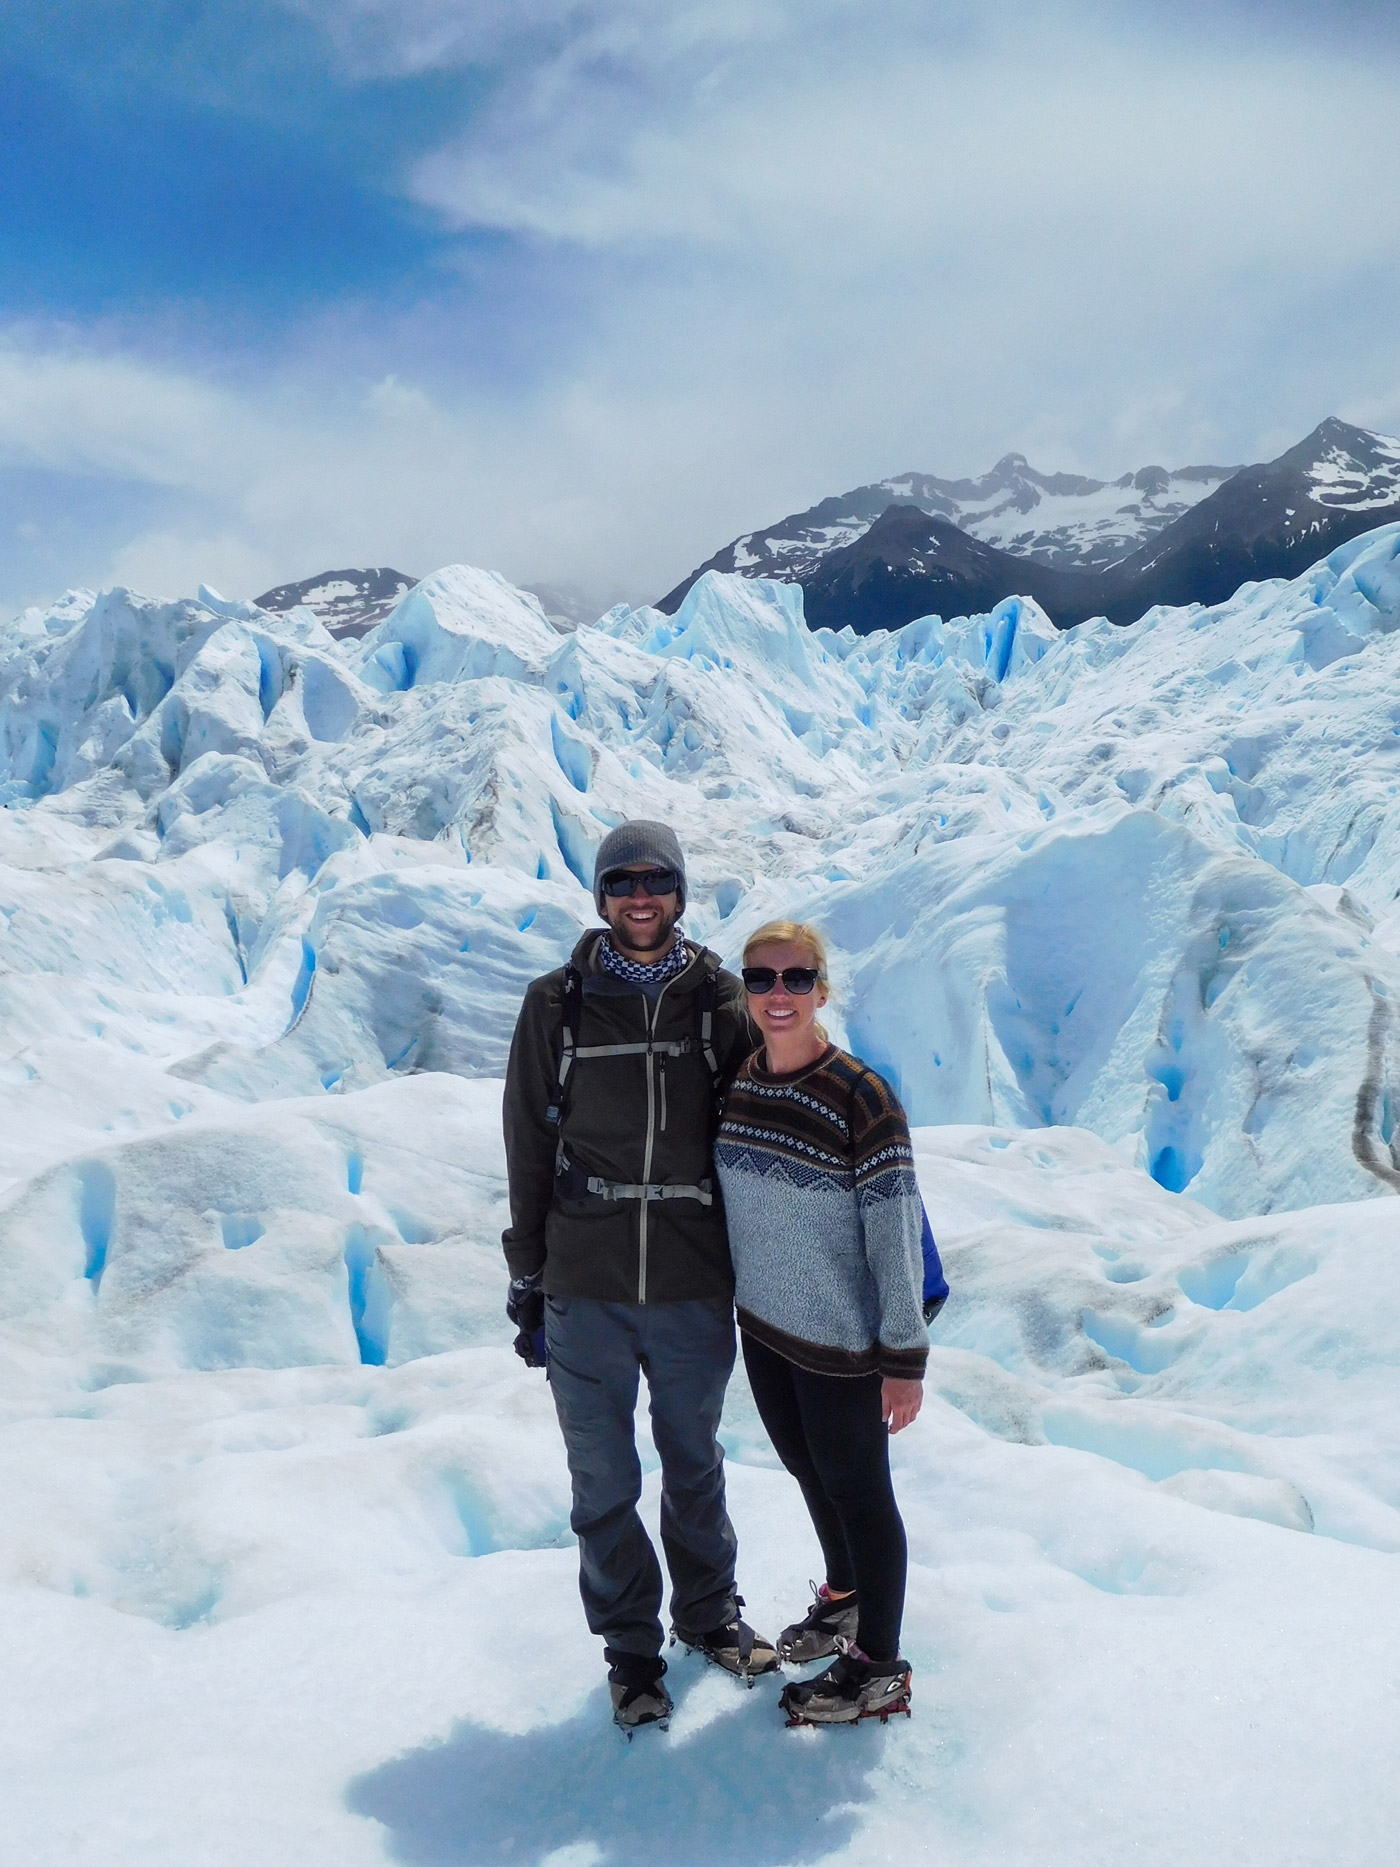 Lauren and I on the glacier